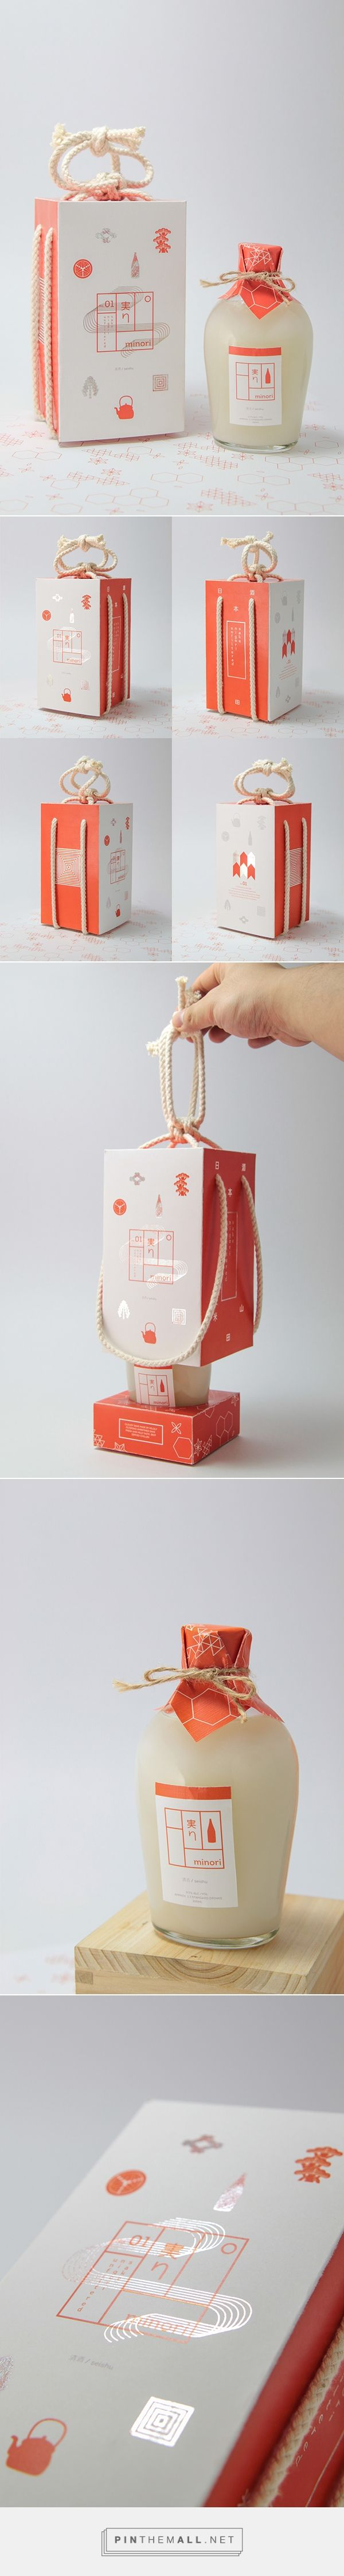 Minori Sake Packaging  by Michael Nguyen on Behance | Fivestar Branding – Design and Branding Agency & Inspiration Gallery